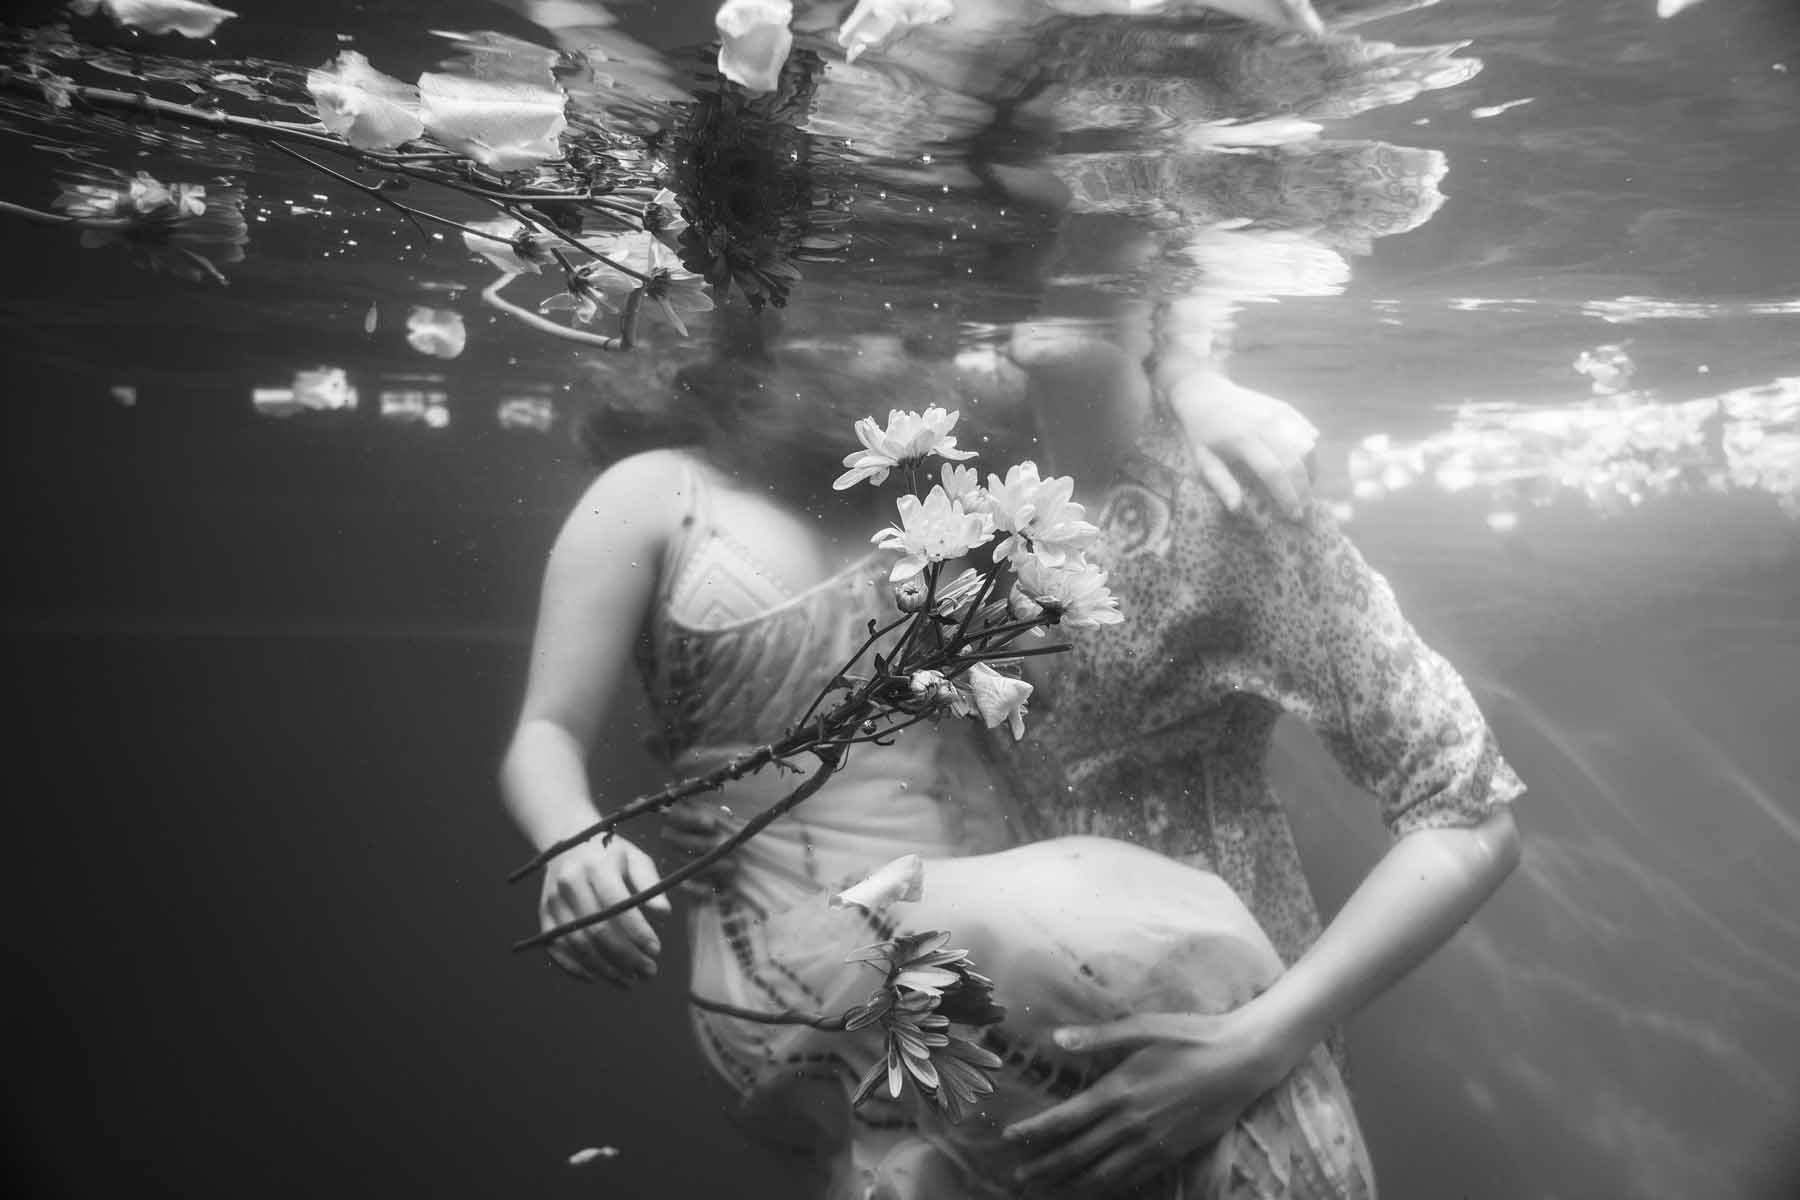 Underwater_175 bnw.jpg